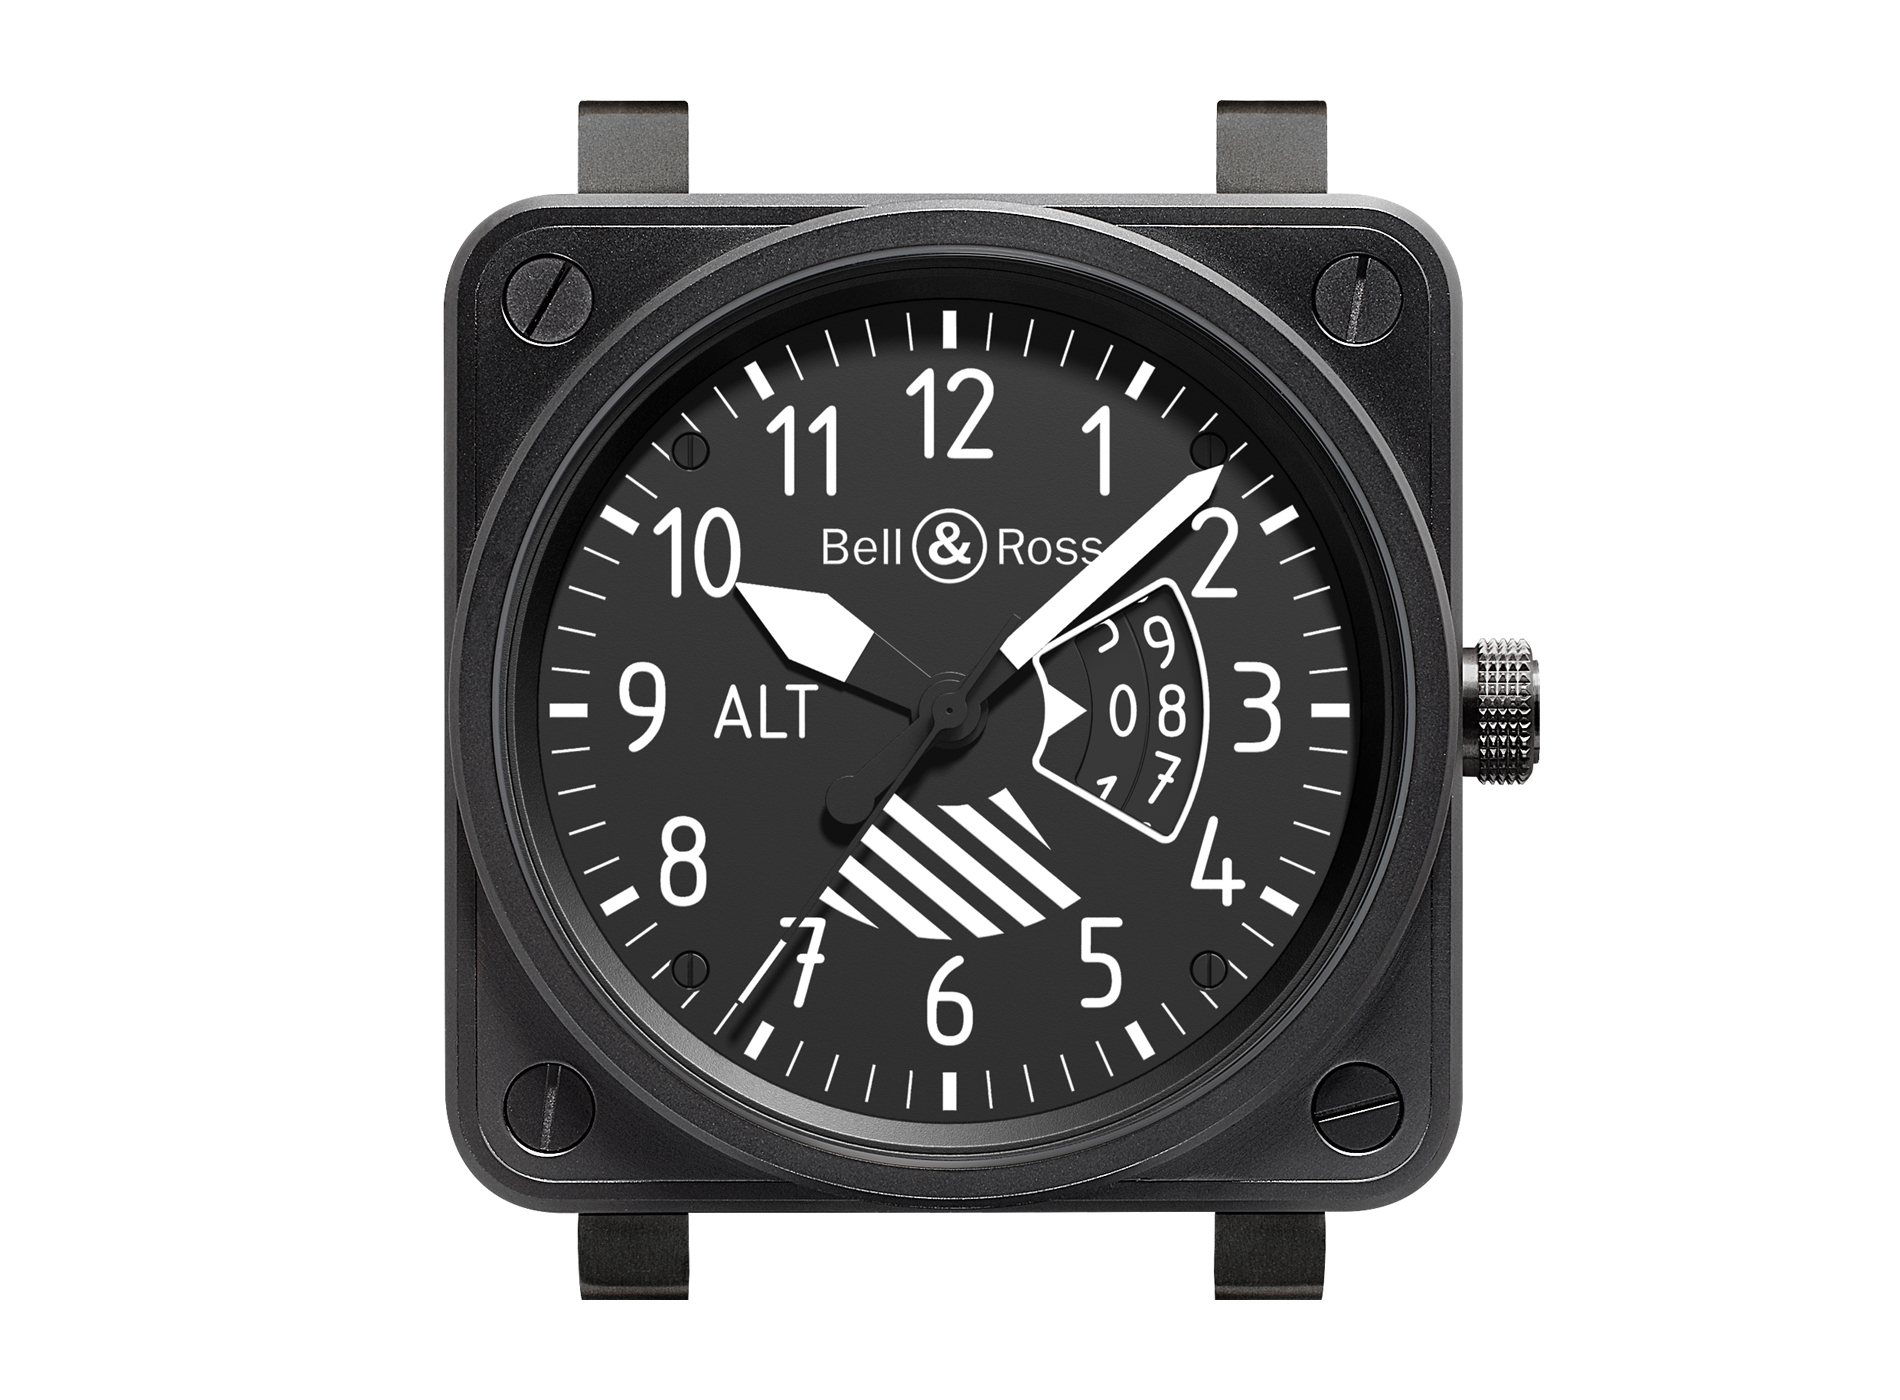 Montre Bell & Ross 03 92 Bi Compass Avioniques